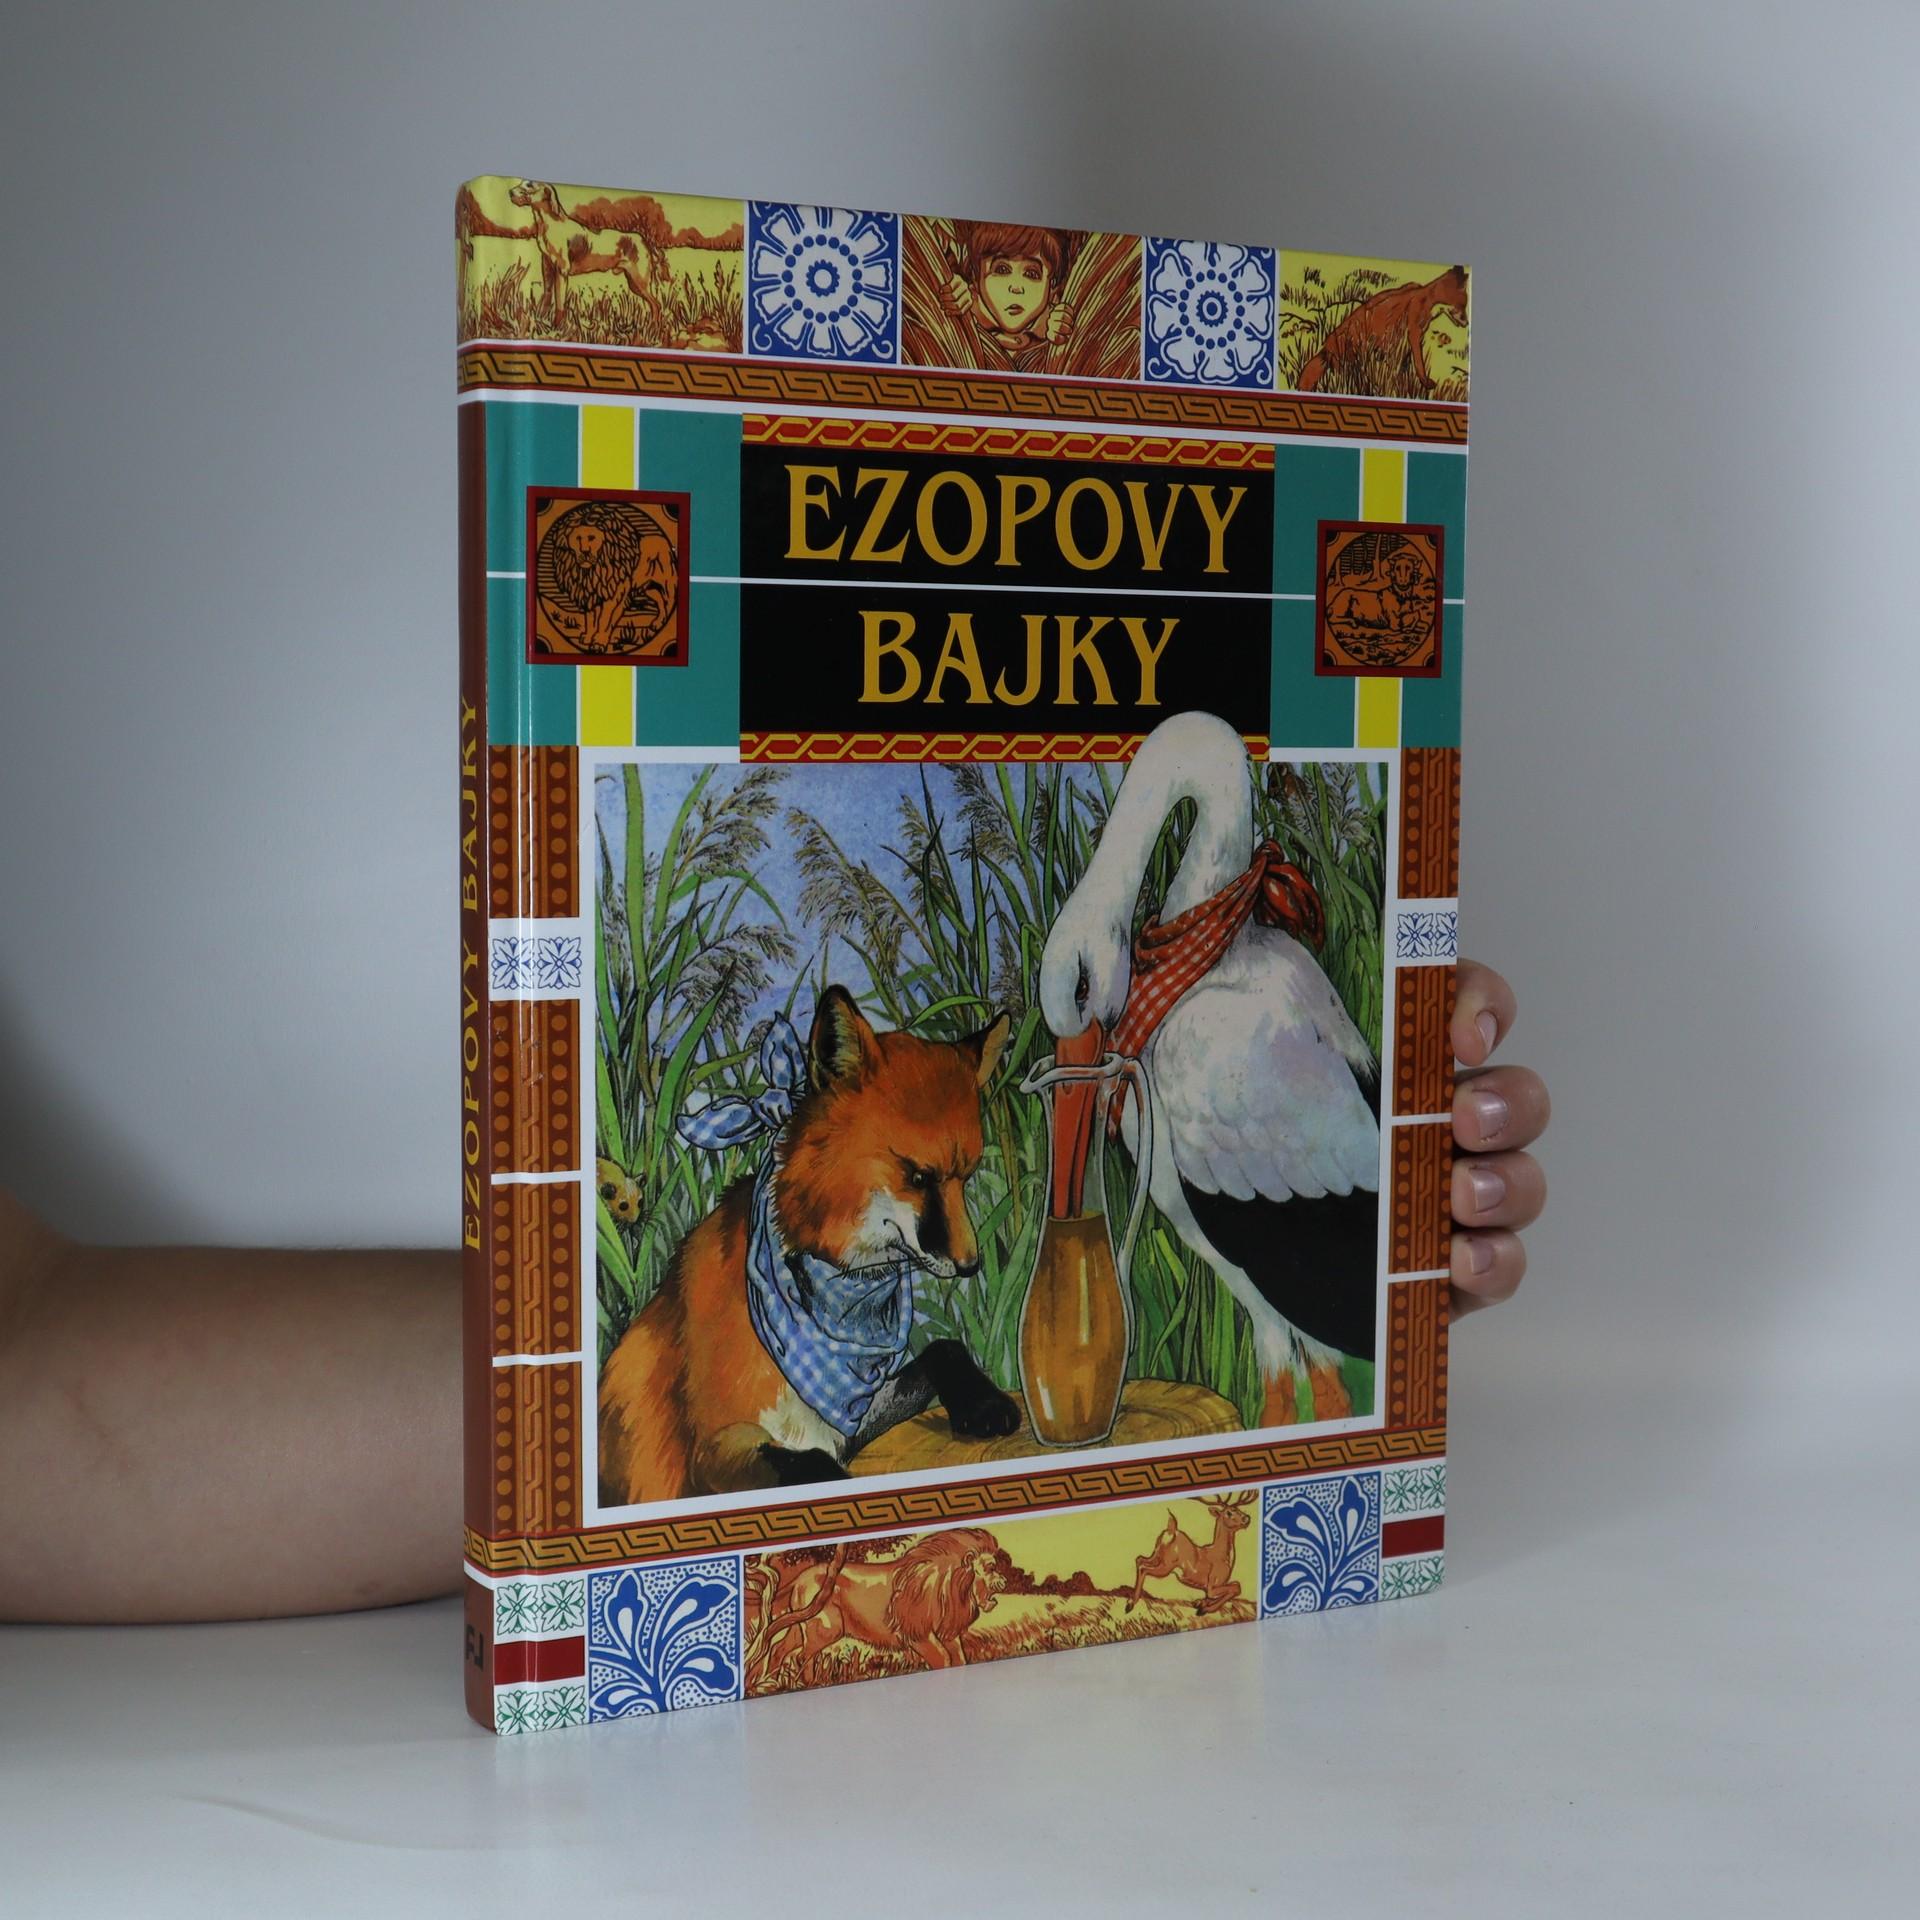 antikvární kniha Ezopovy bajky, 2015